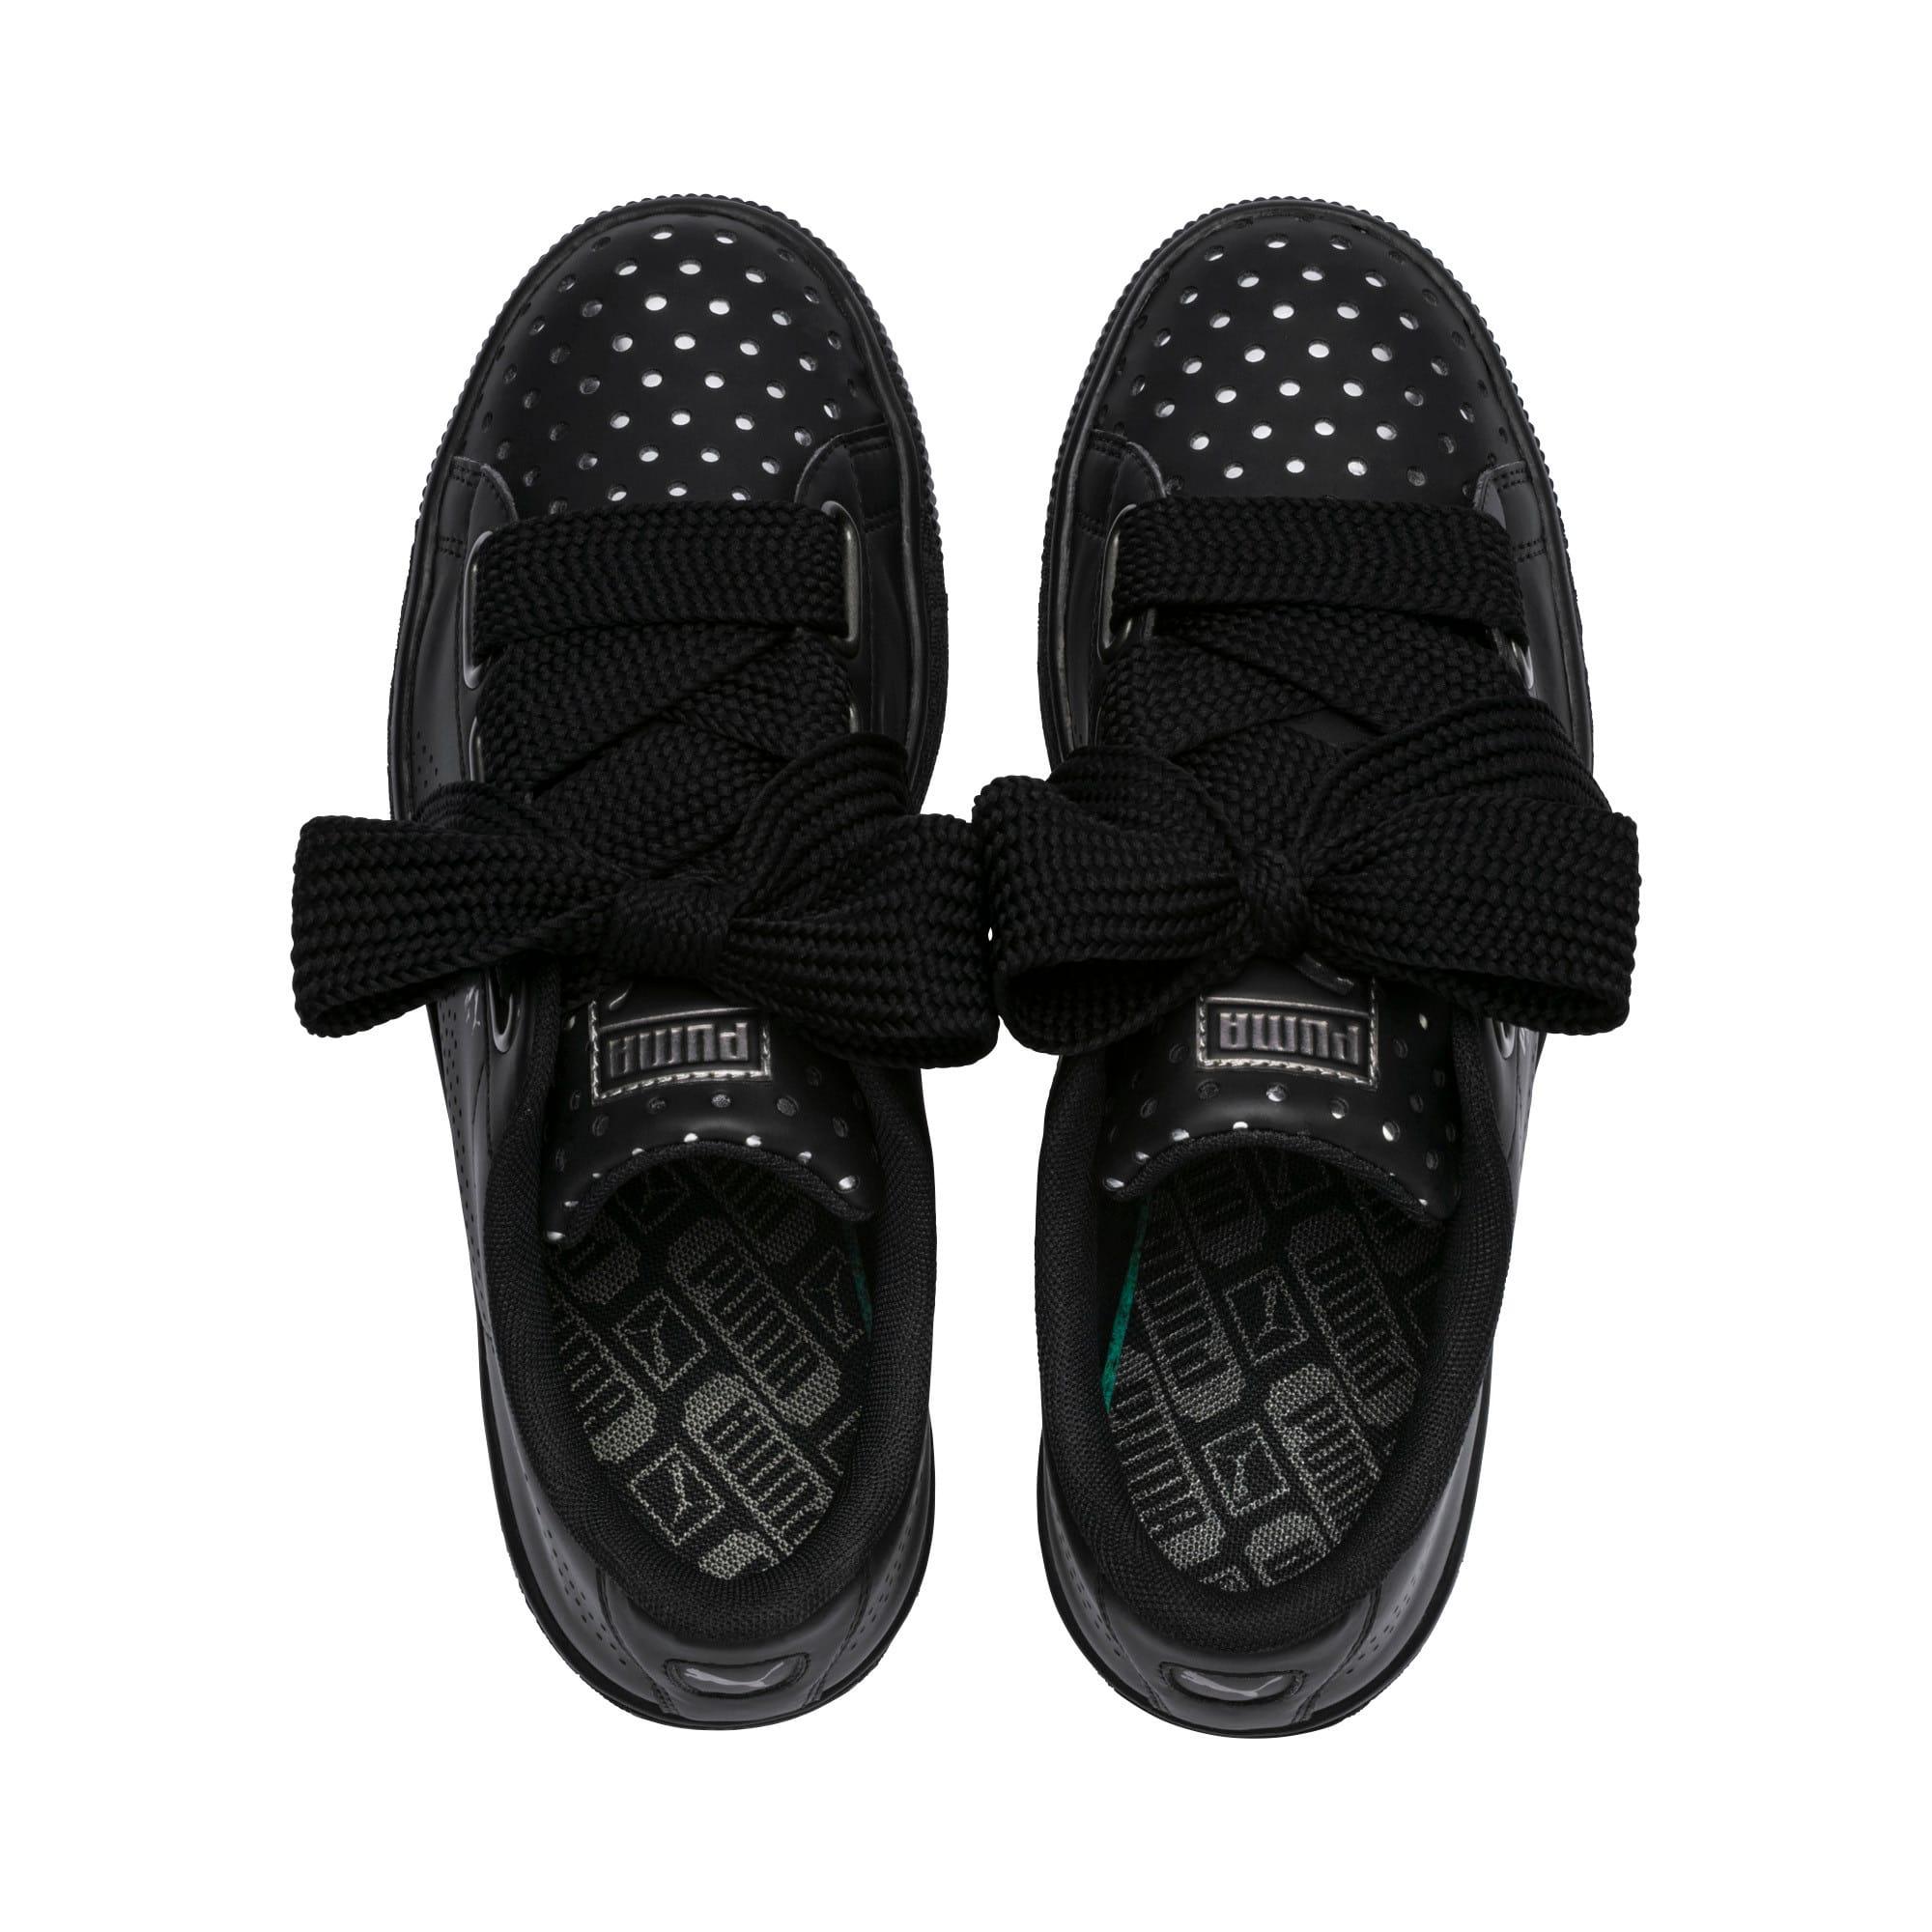 Thumbnail 6 of Basket Heart Lux Women's Sneakers, Puma Black-Puma Black, medium